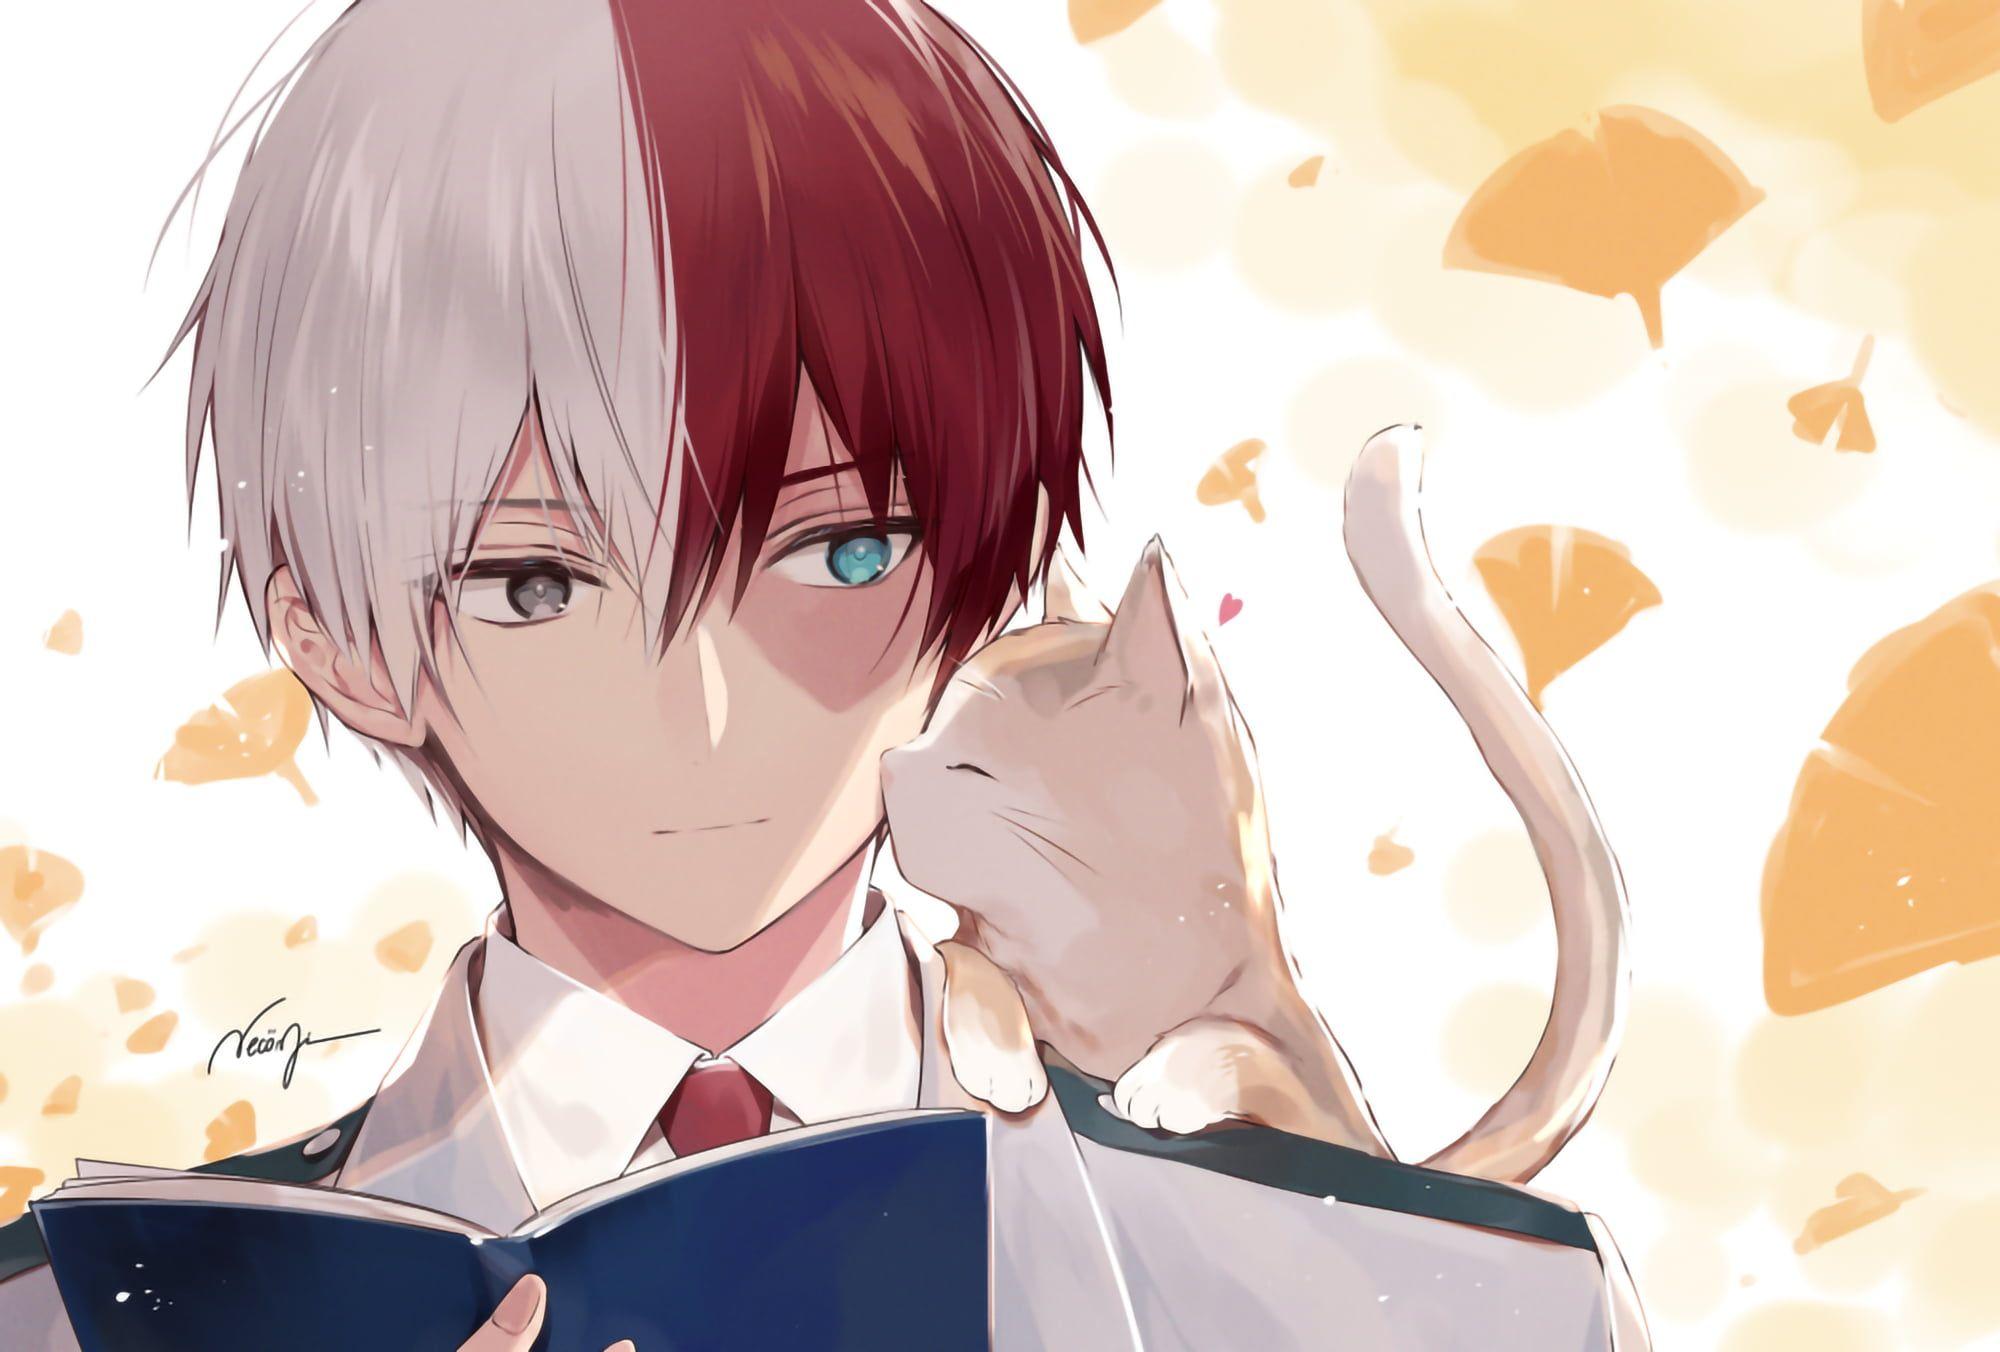 Shoto Todoroki In 2020 My Hero Academia Episodes Cute Anime Guys Hero